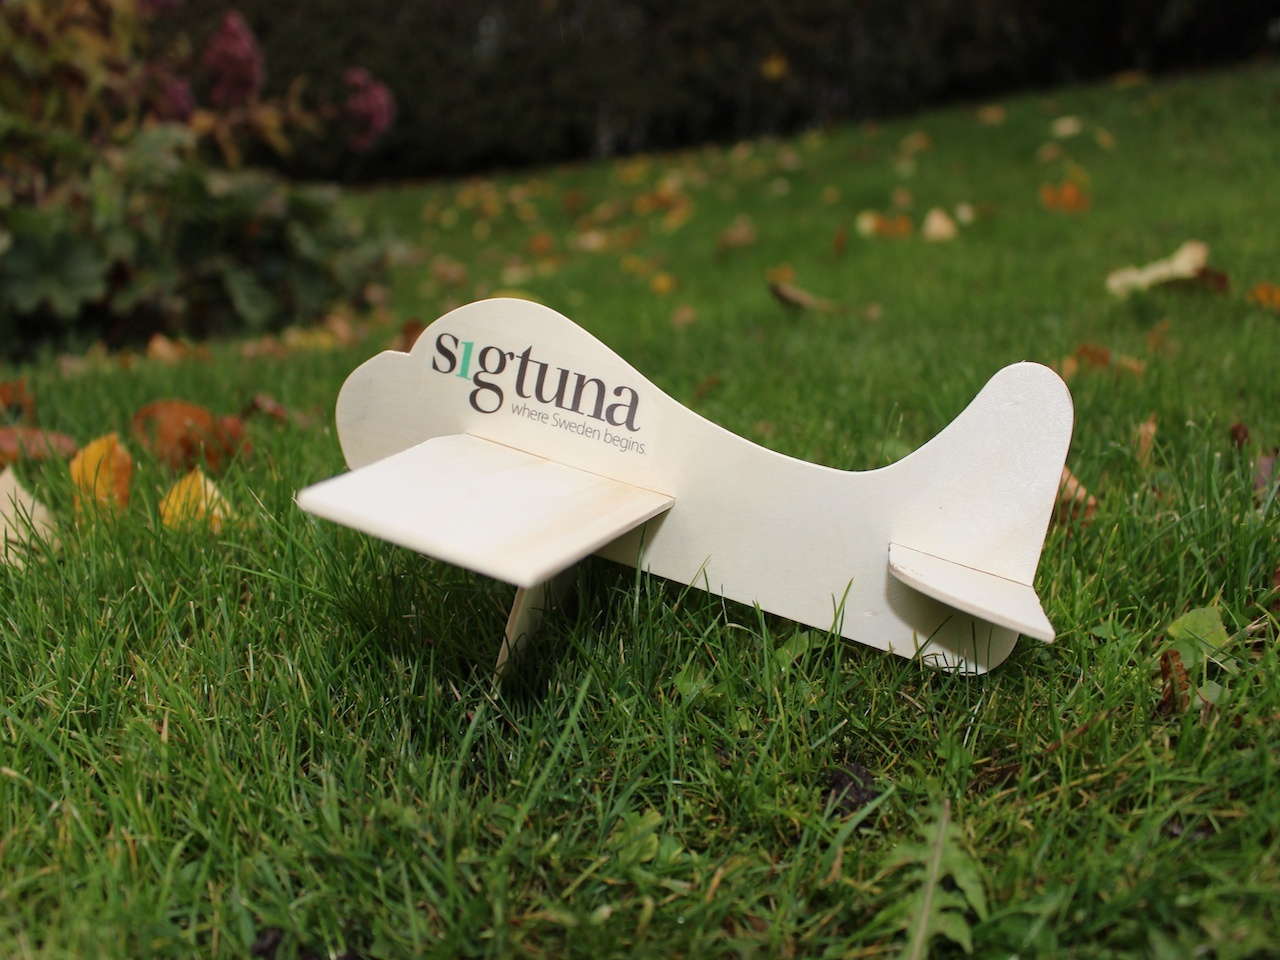 modellflygplan.jpg